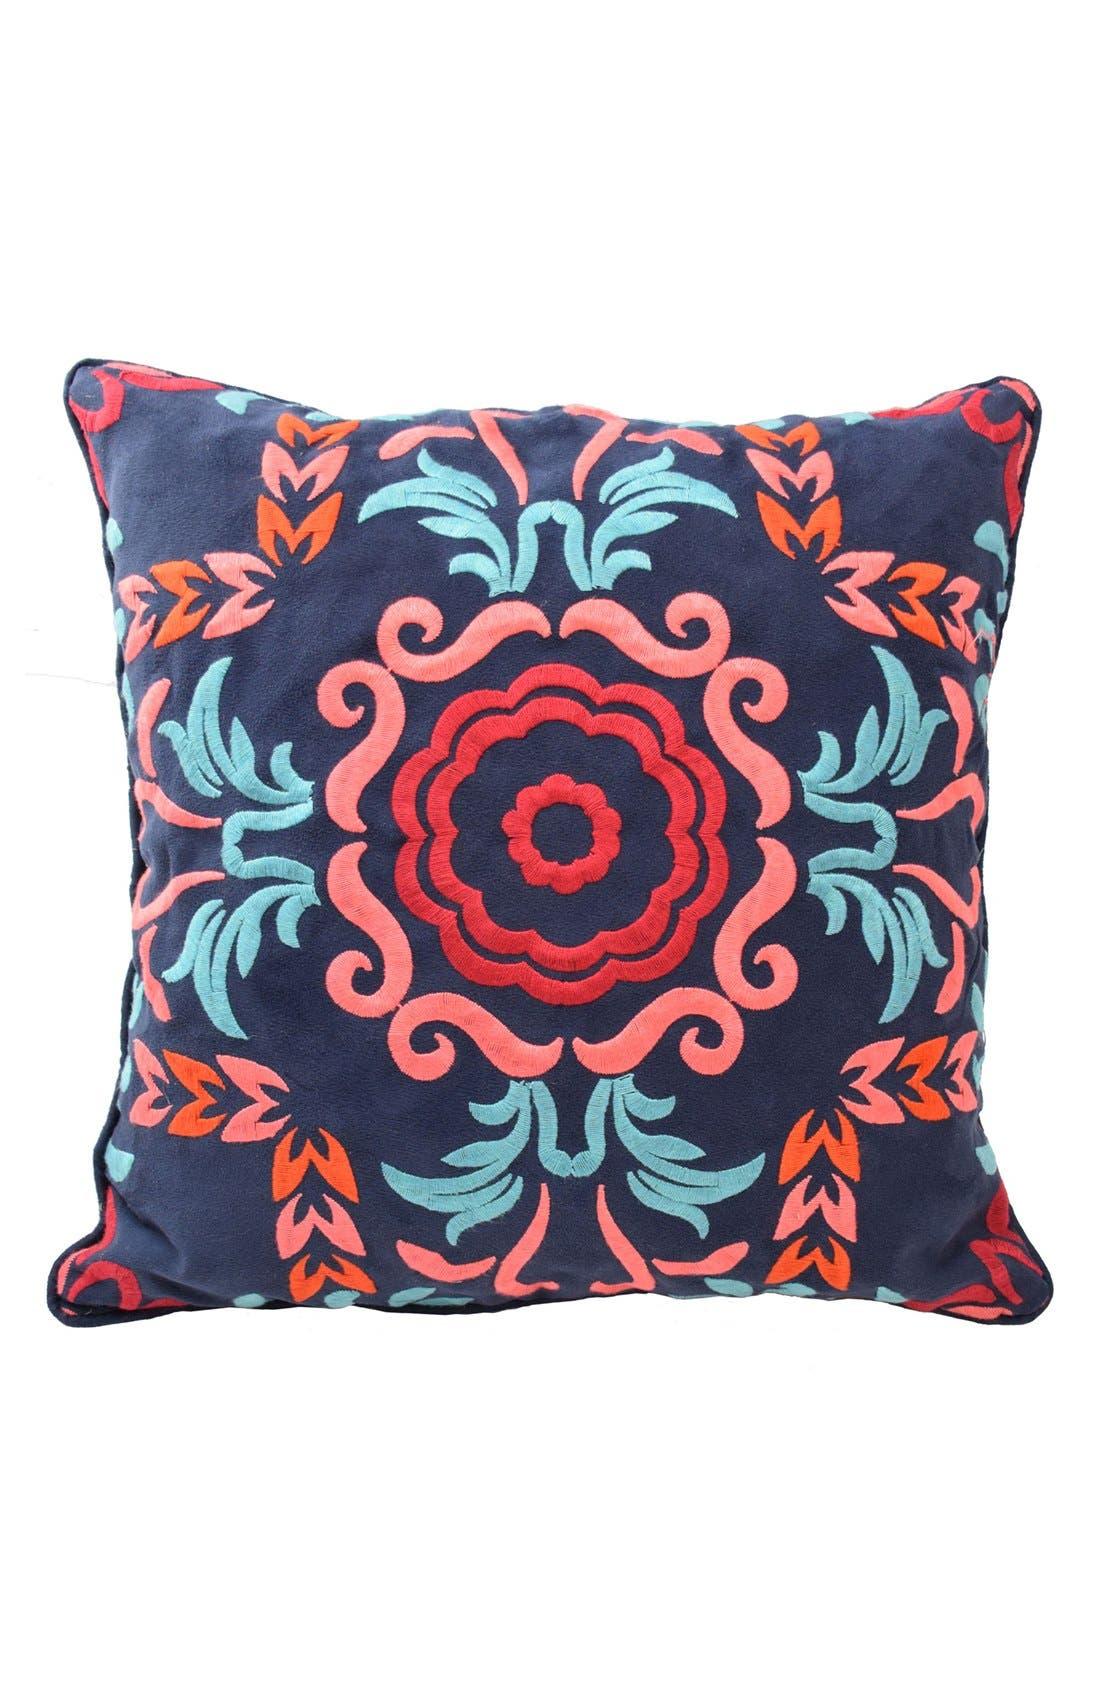 'Viva Mexico' Pillow,                         Main,                         color, Navy Multi